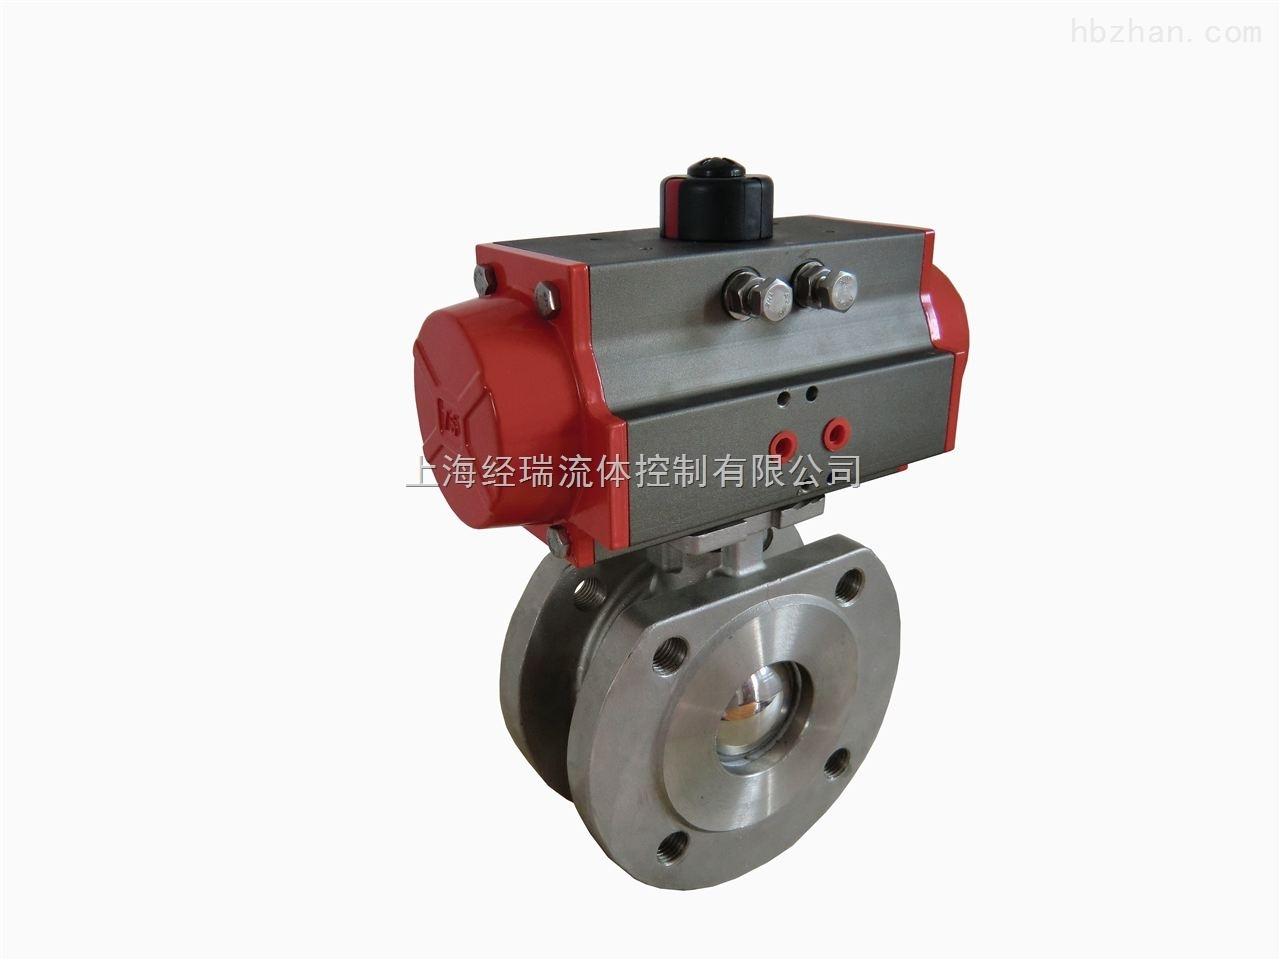 bv1-气动薄型球阀-上海经瑞流体控制有限公司图片